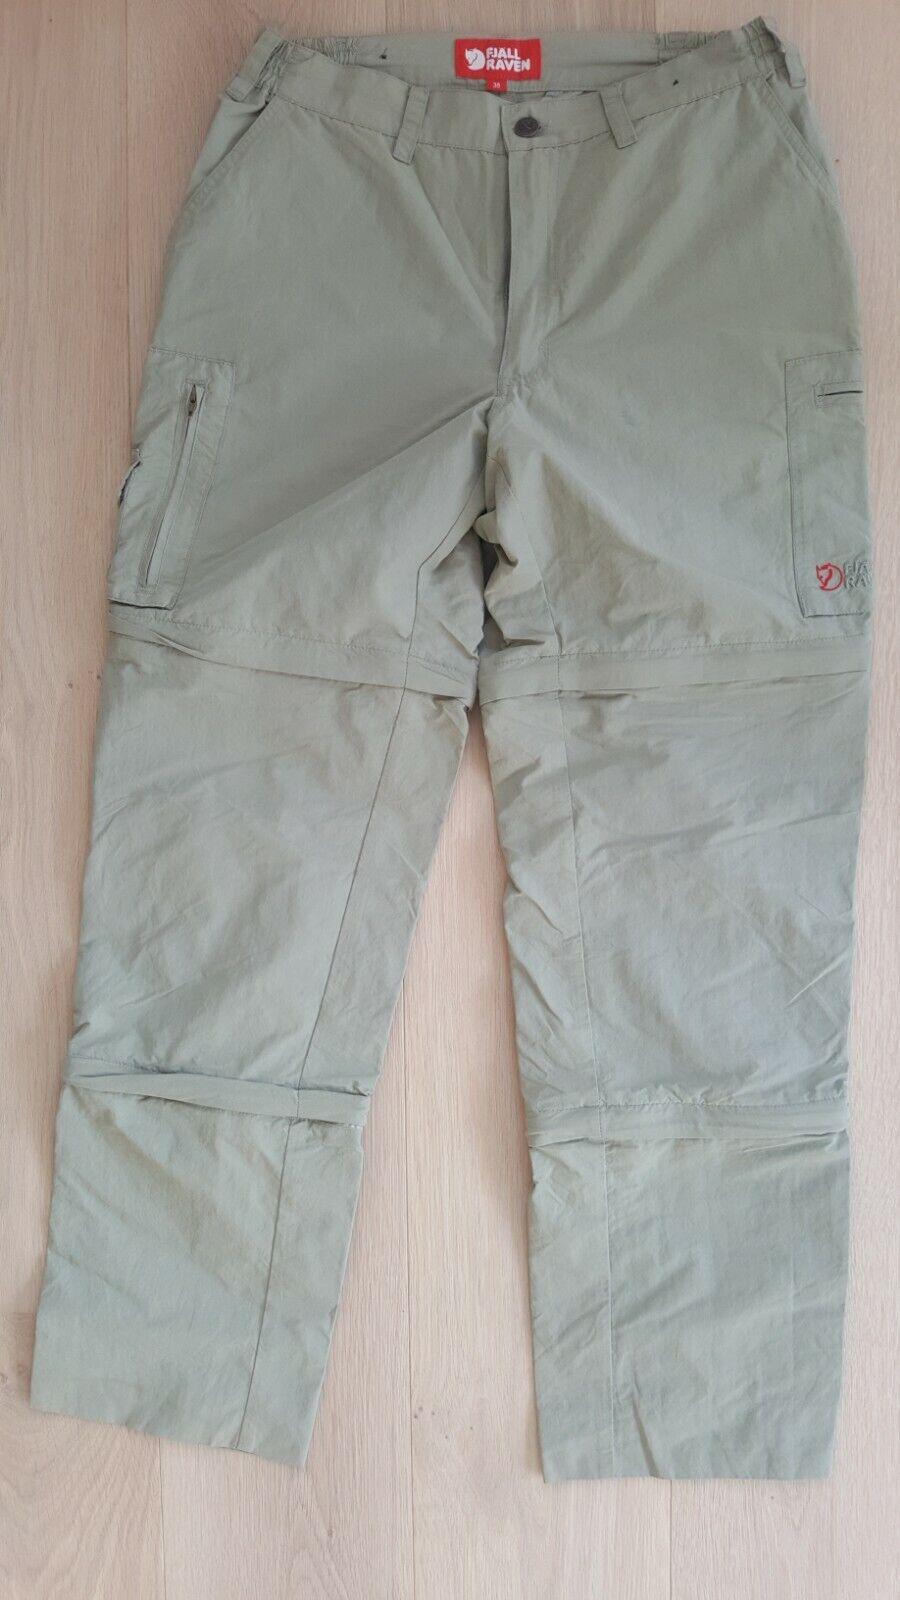 Fjallraven Hiking Pants Zip Off Trekking Trousers Womannen's afmeting EU 38